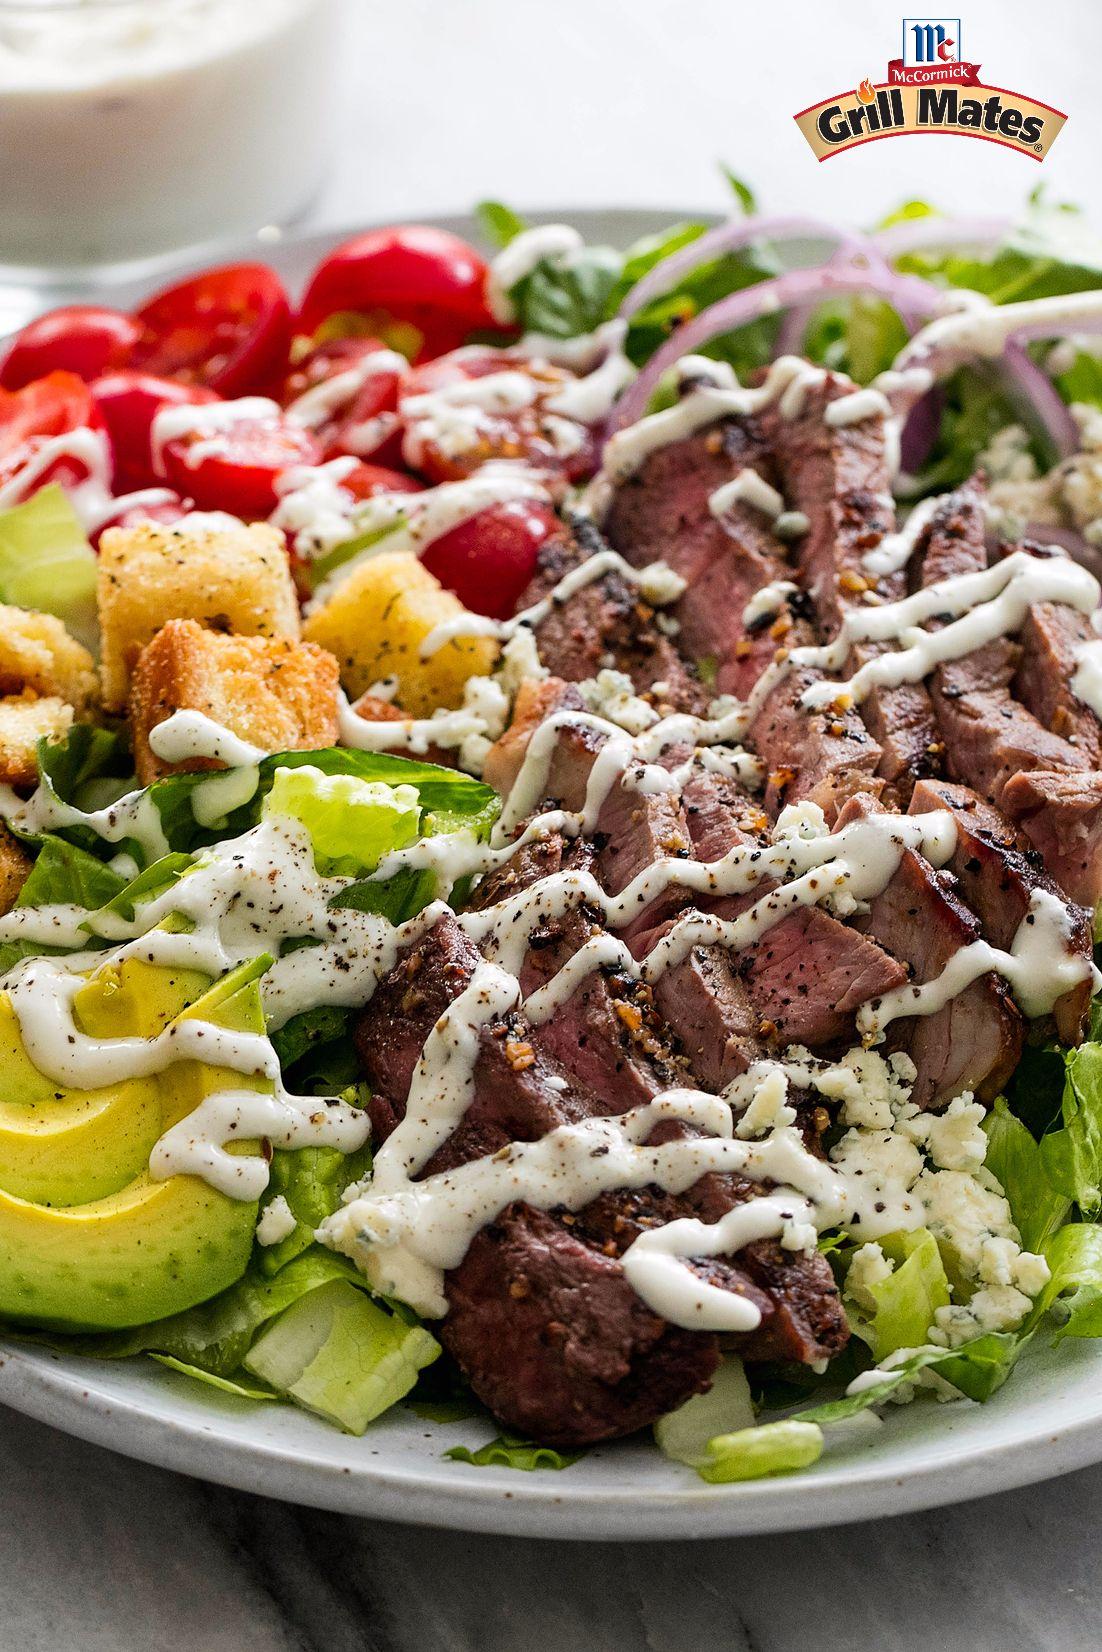 Black N Blue Grilled Steak Salad Recipe Steak Salad Recipe Grilled Steak Salad Steak Salad